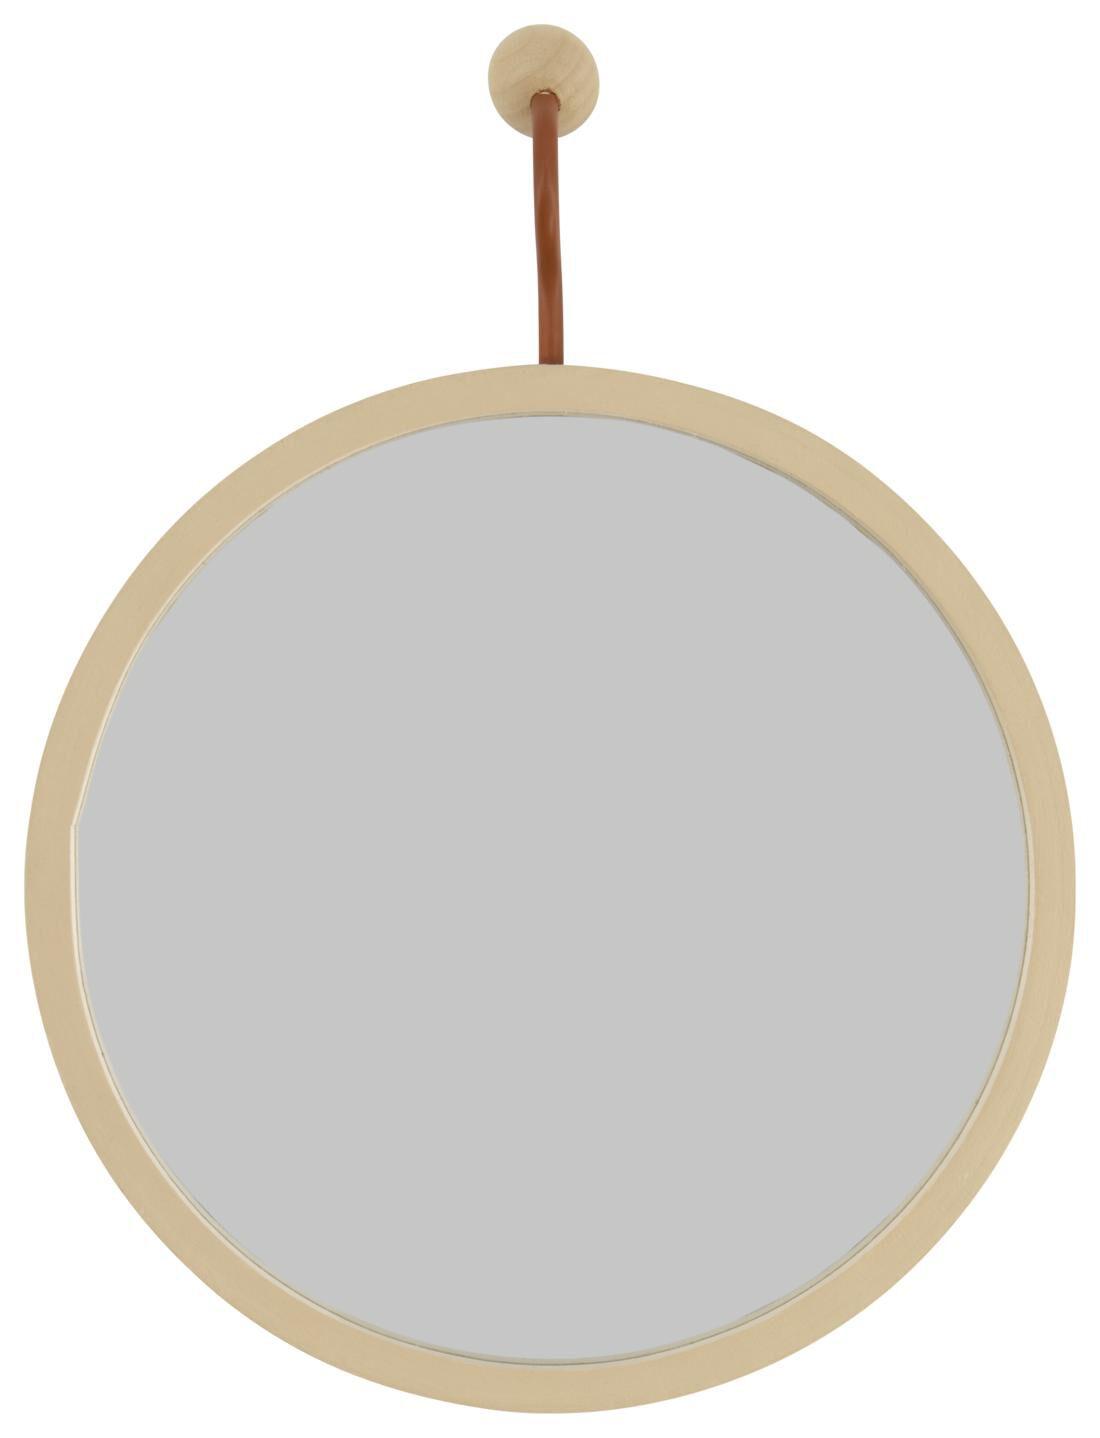 HEMA Spiegel Ø17cm - Hout